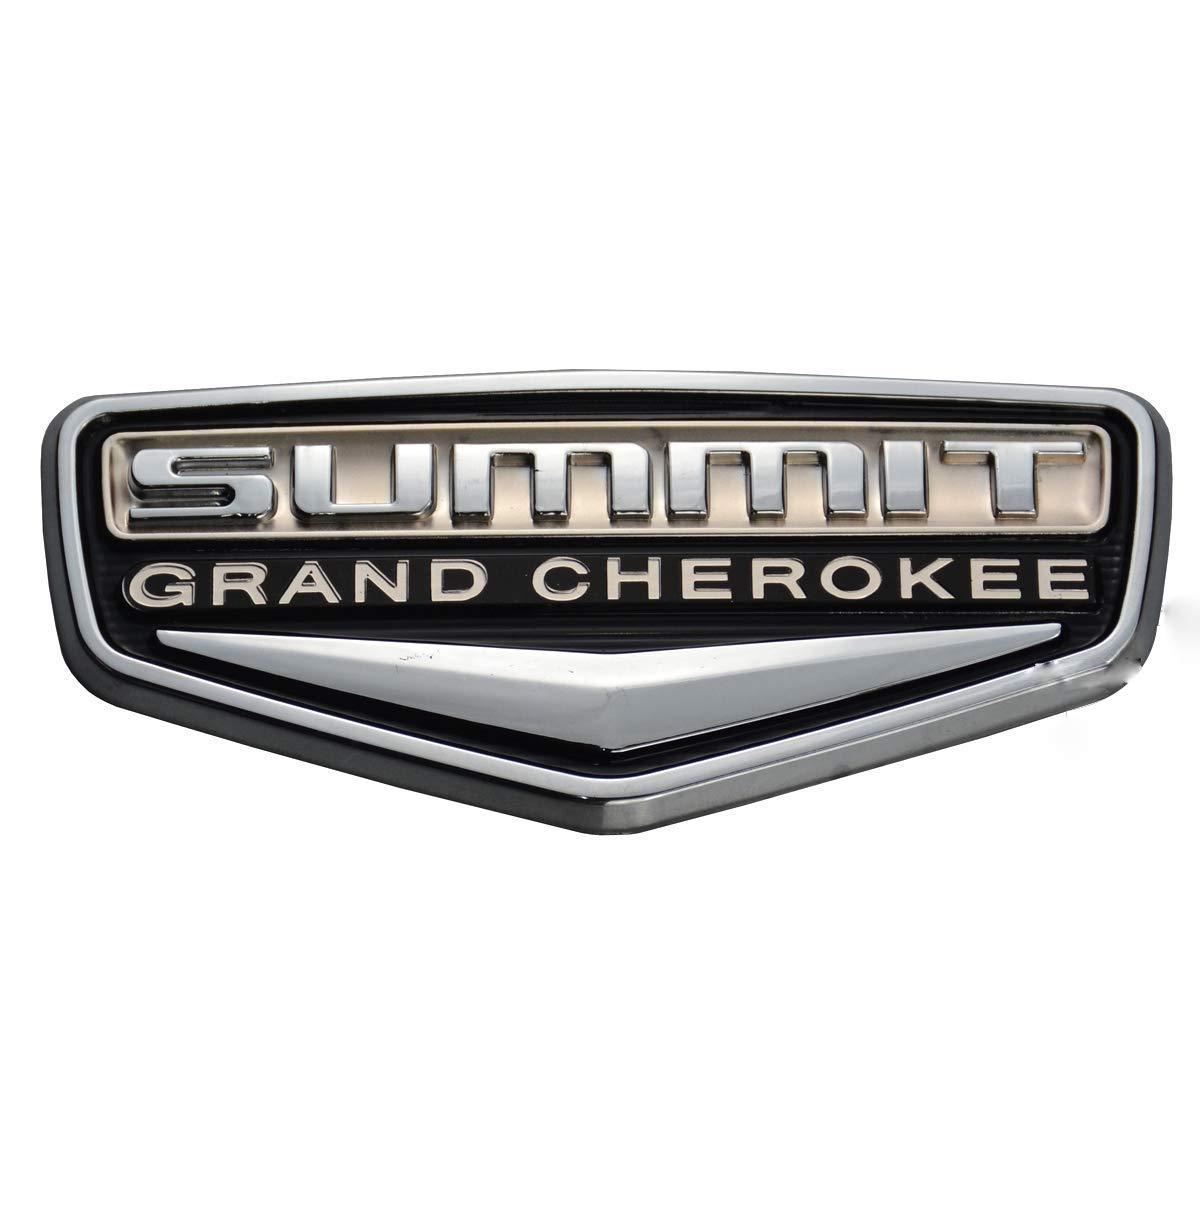 SRT Grille Grill Plaque Plate Emblem Badge Street Racing Technology luminum Nameplate Logo Decal Rare JDM for Dodge Challenger Charger for Magnum Ram Chrysler Nassau Jeep Grand Cherokee SRT Hemi